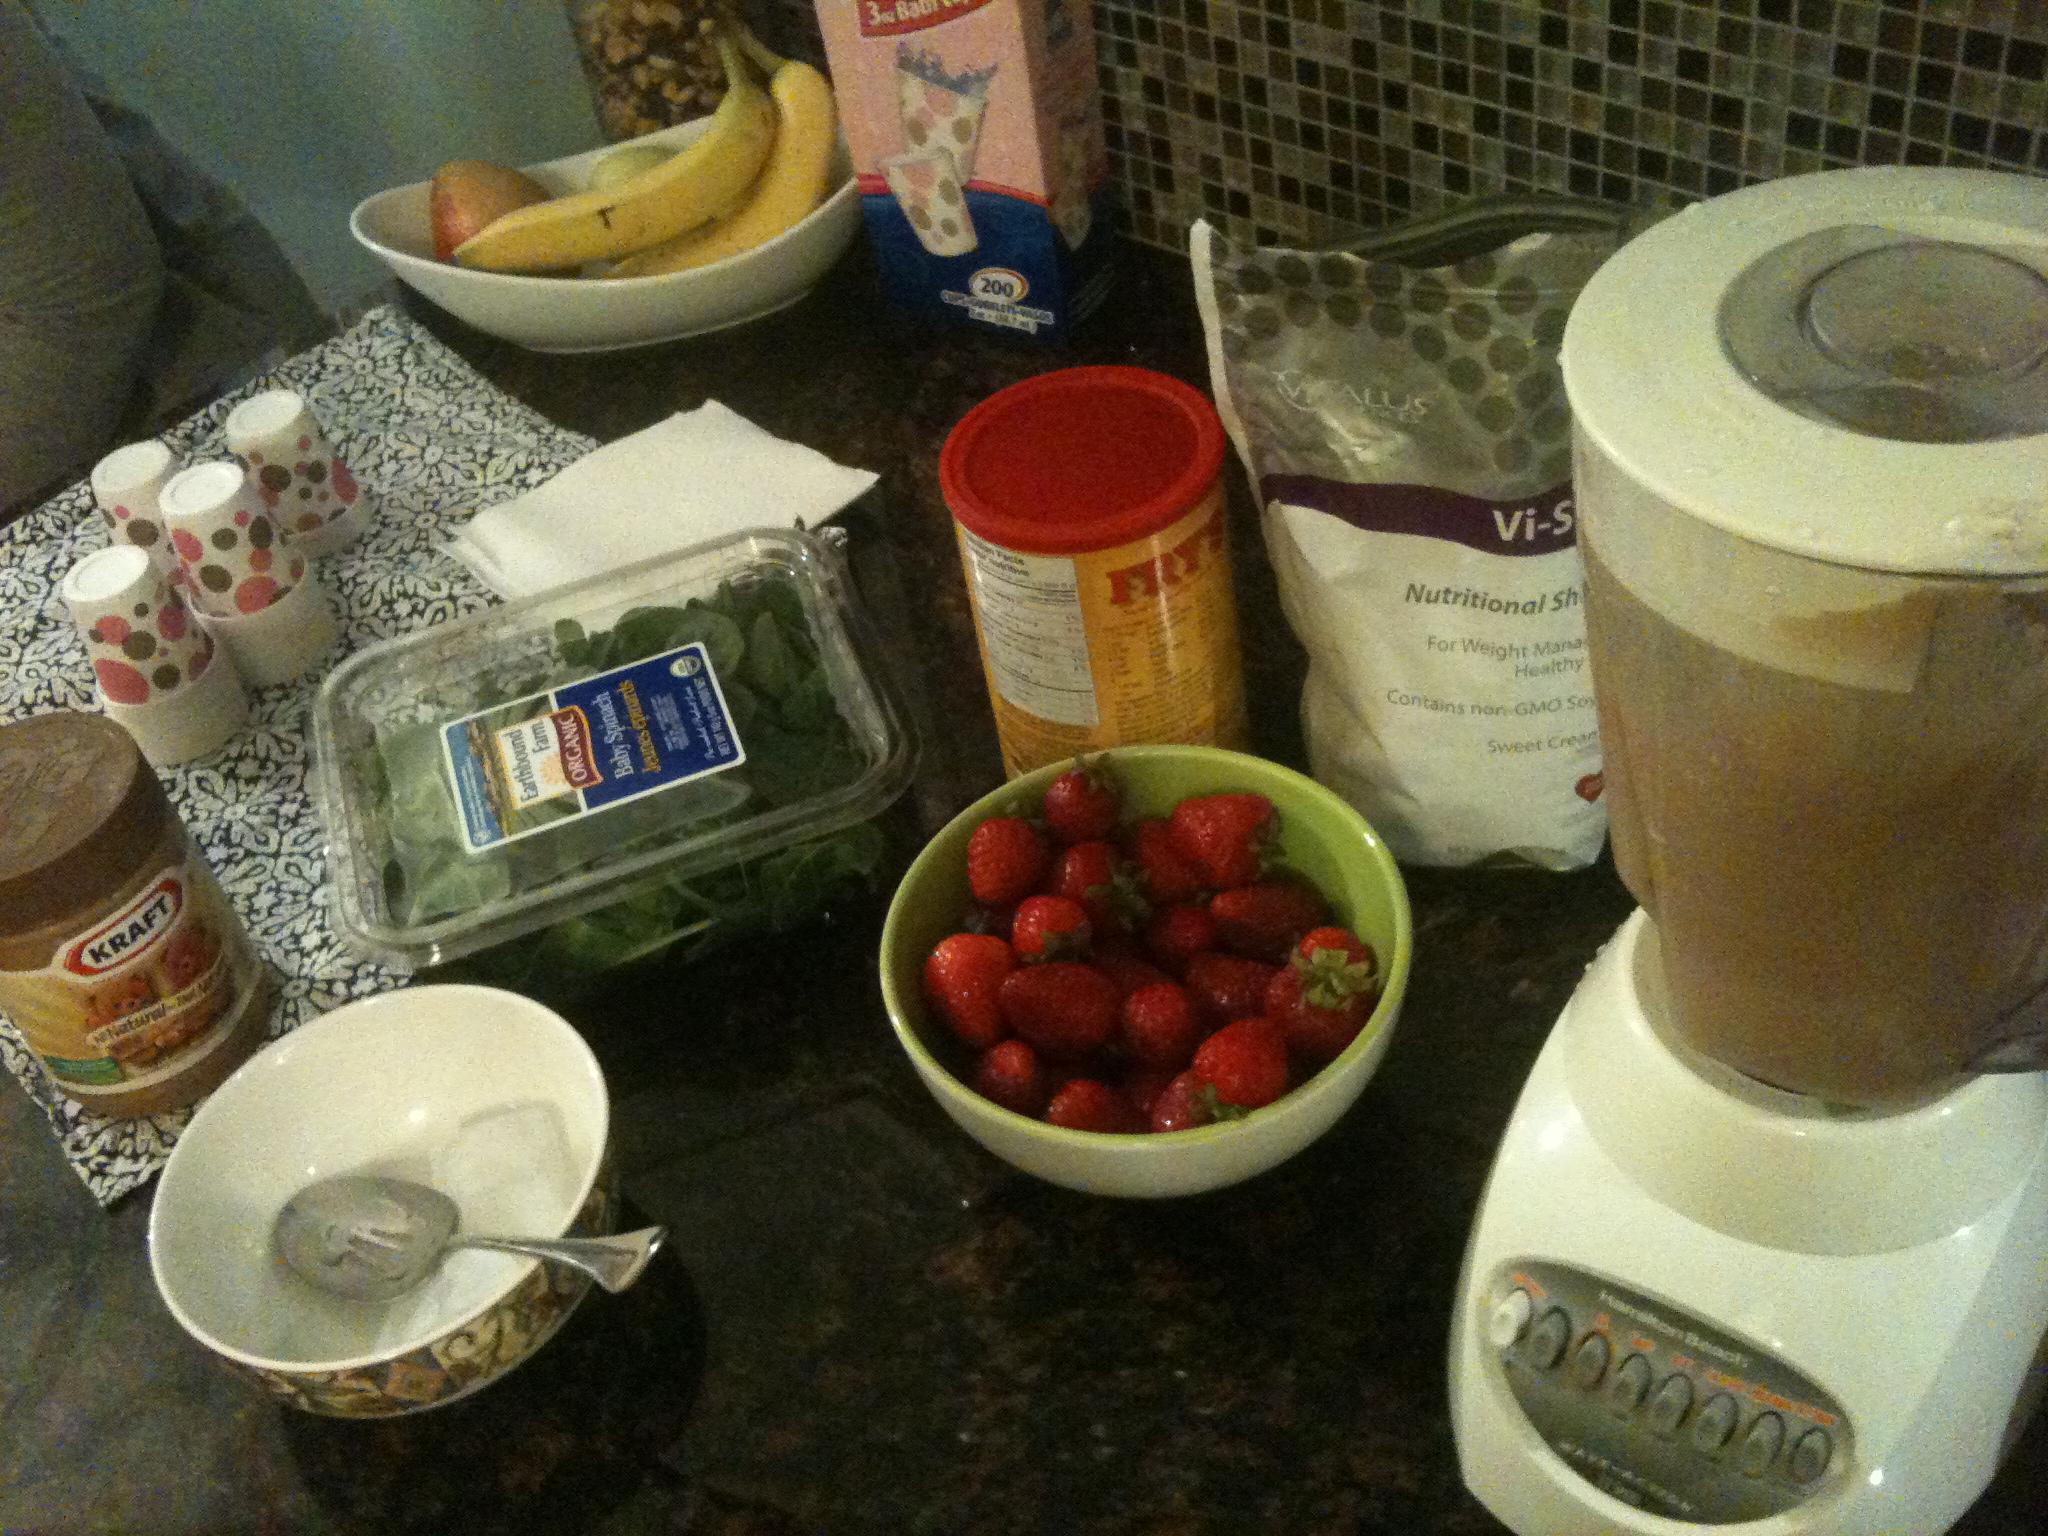 Breakfast - Vi-shake!